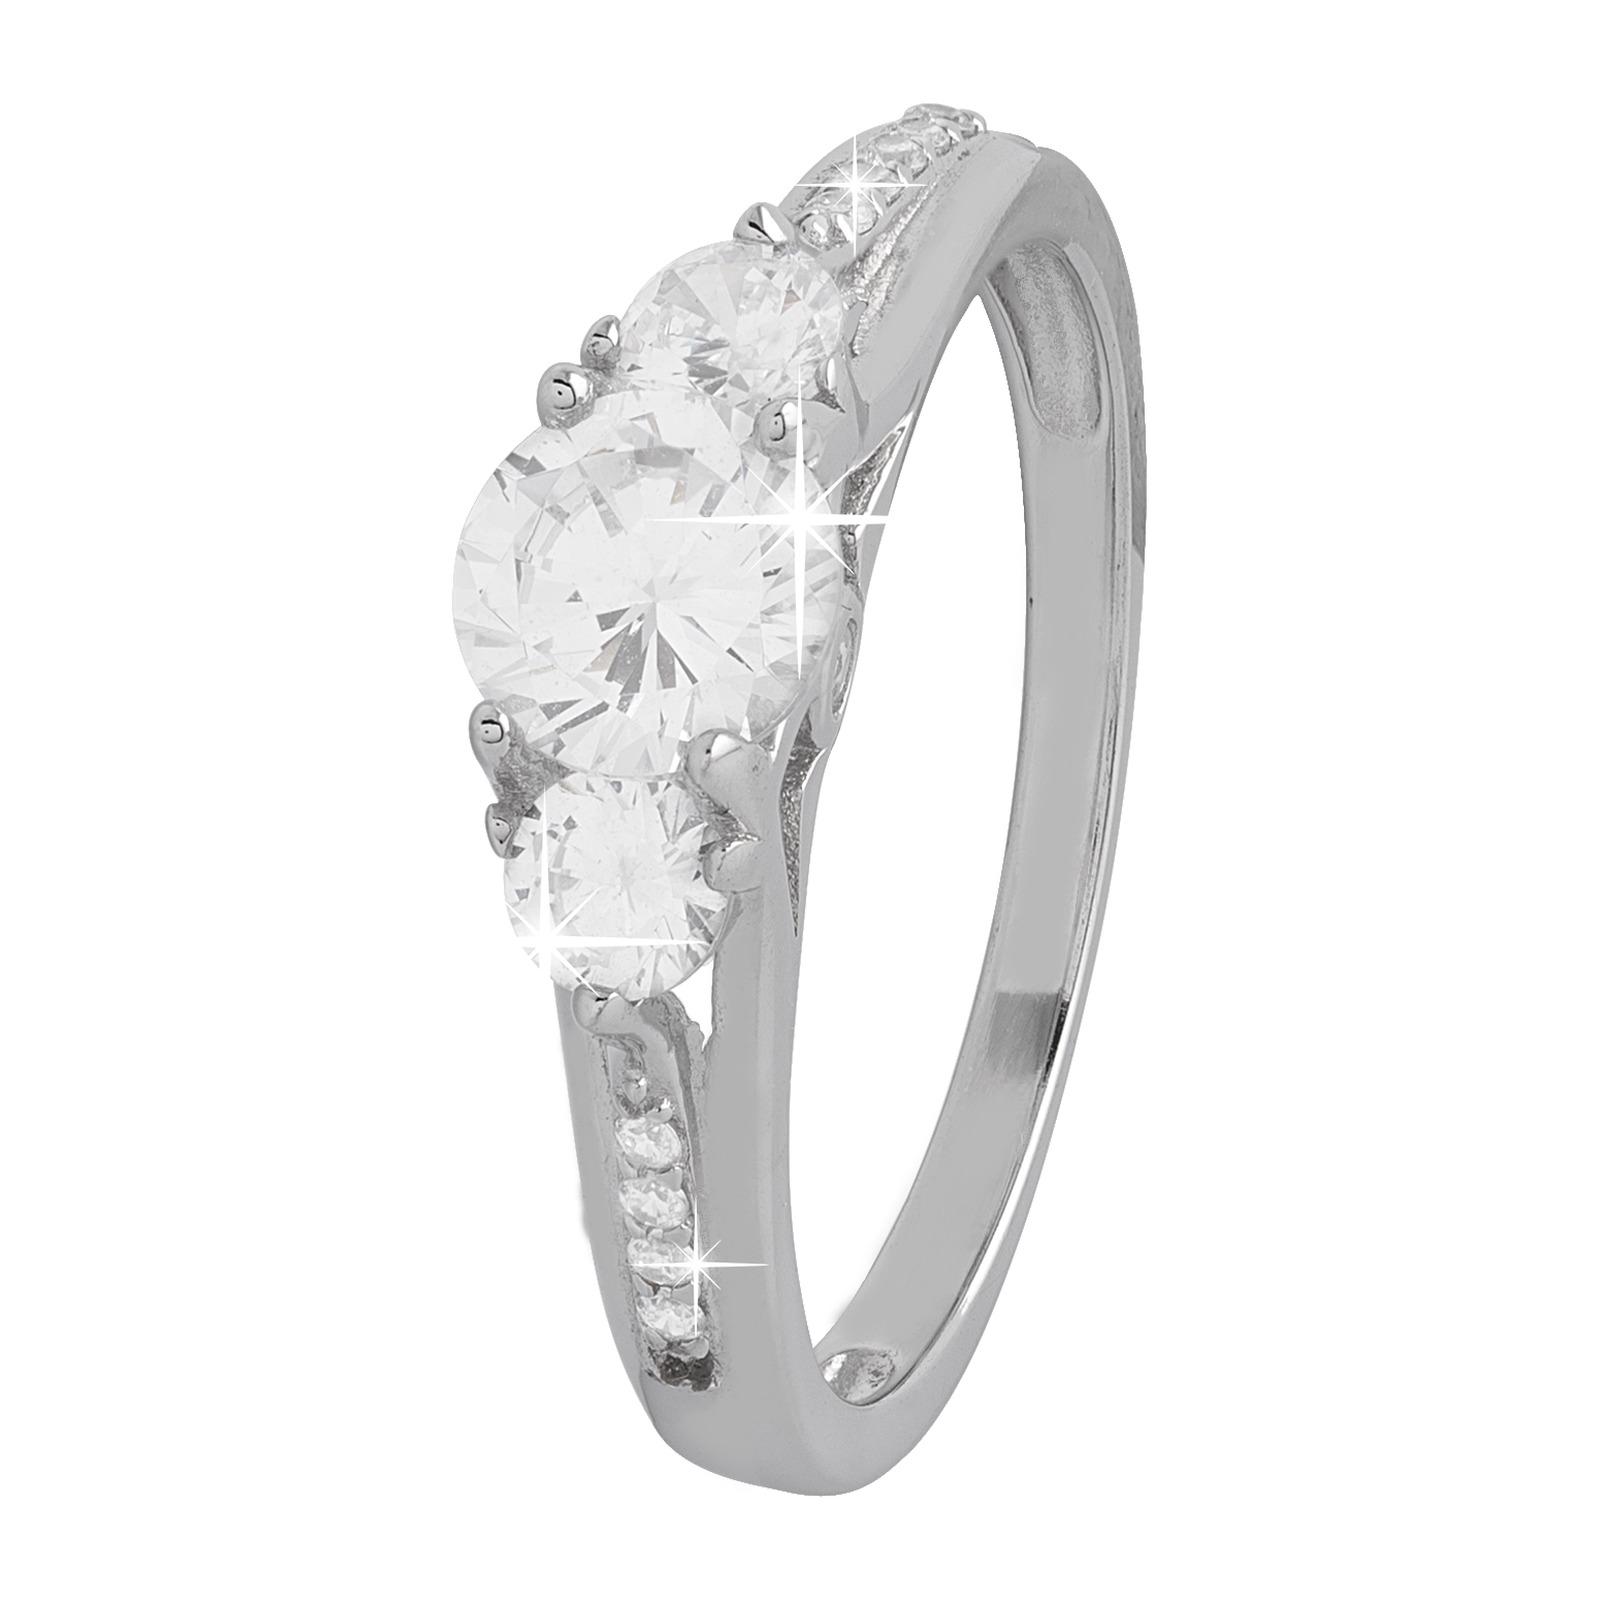 Ring Sterling Silver 925